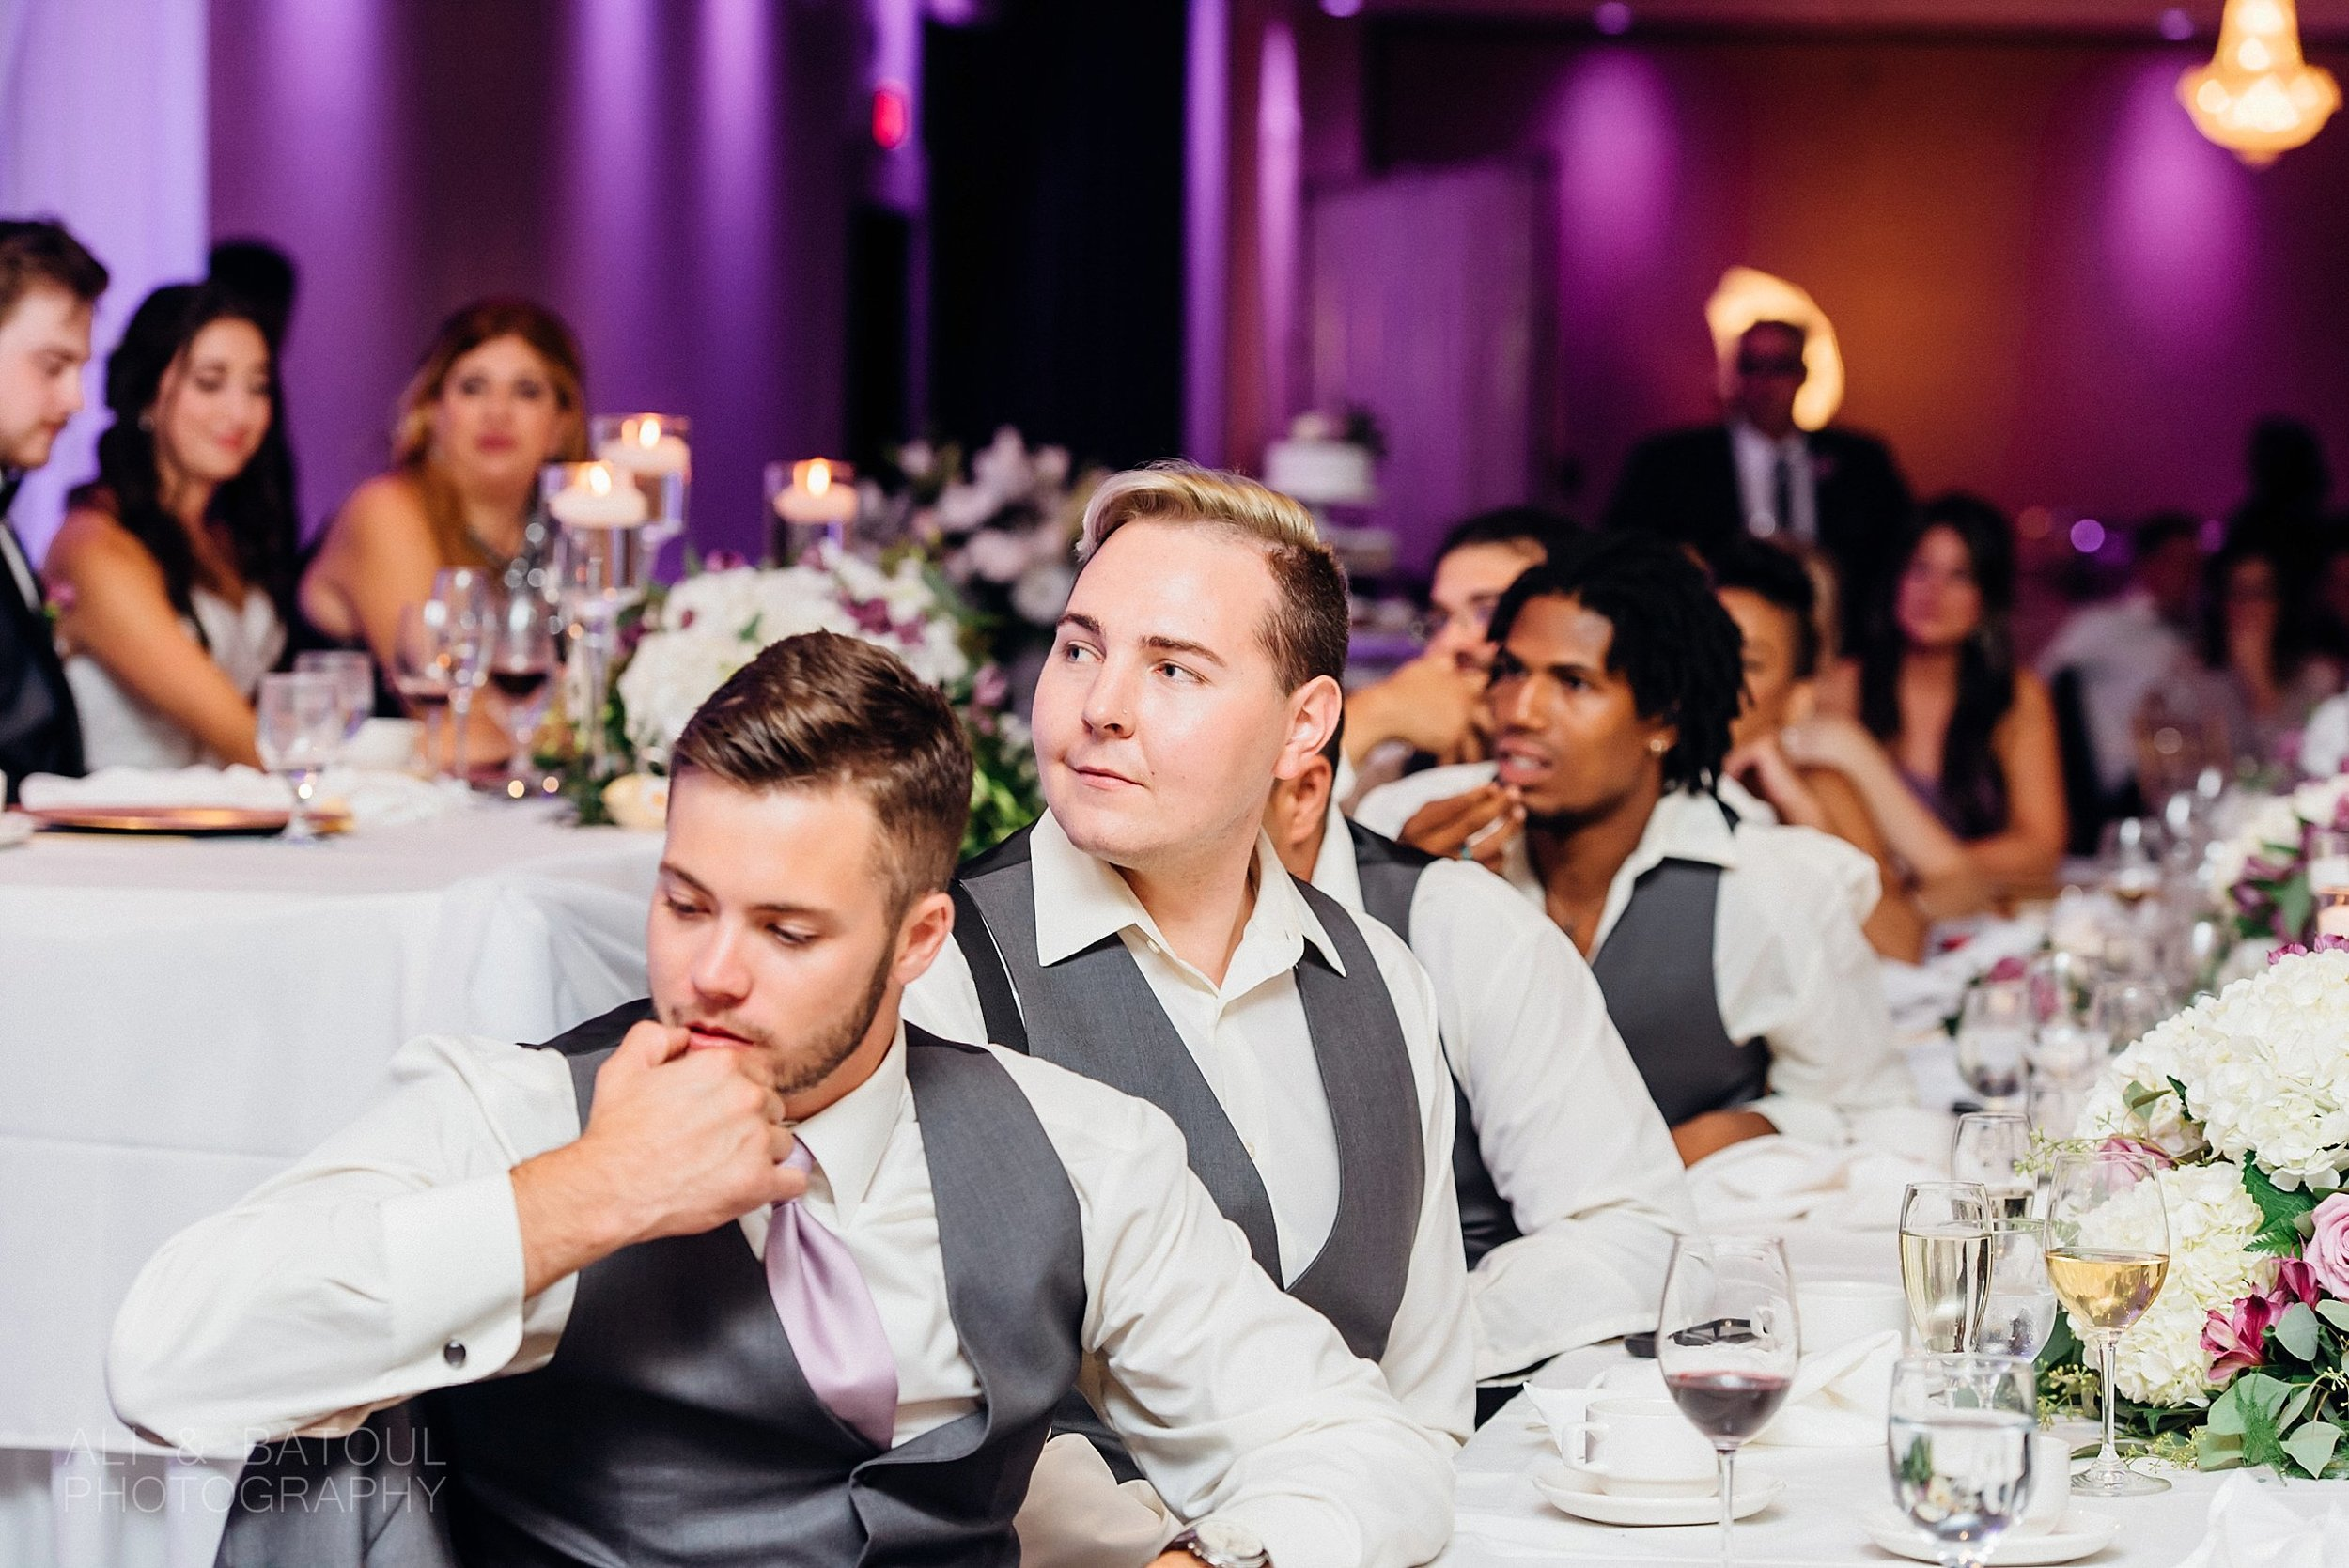 Ali and Batoul Photography - light, airy, indie documentary Ottawa wedding photographer_0078.jpg